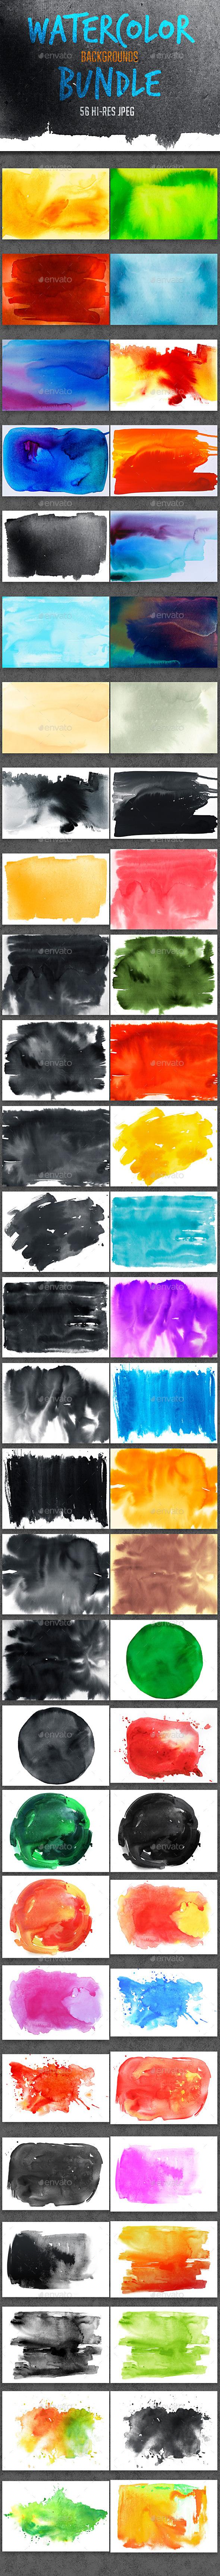 GraphicRiver Watercolor Backgrounds Bundle 10503030